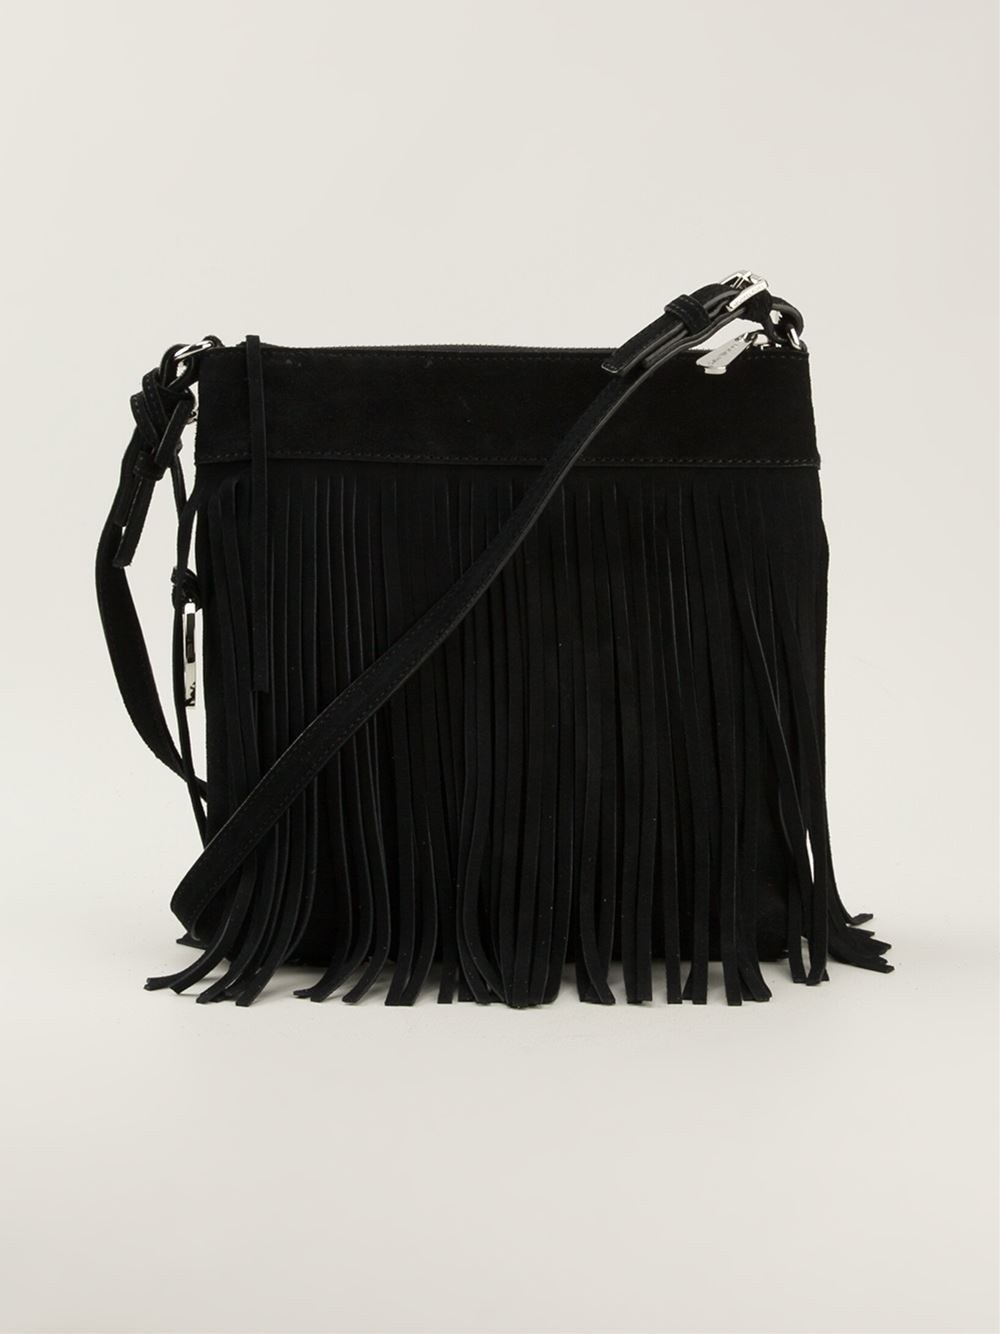 1f22750f4e MICHAEL Michael Kors Small Billy Messenger Bag in Black - Lyst